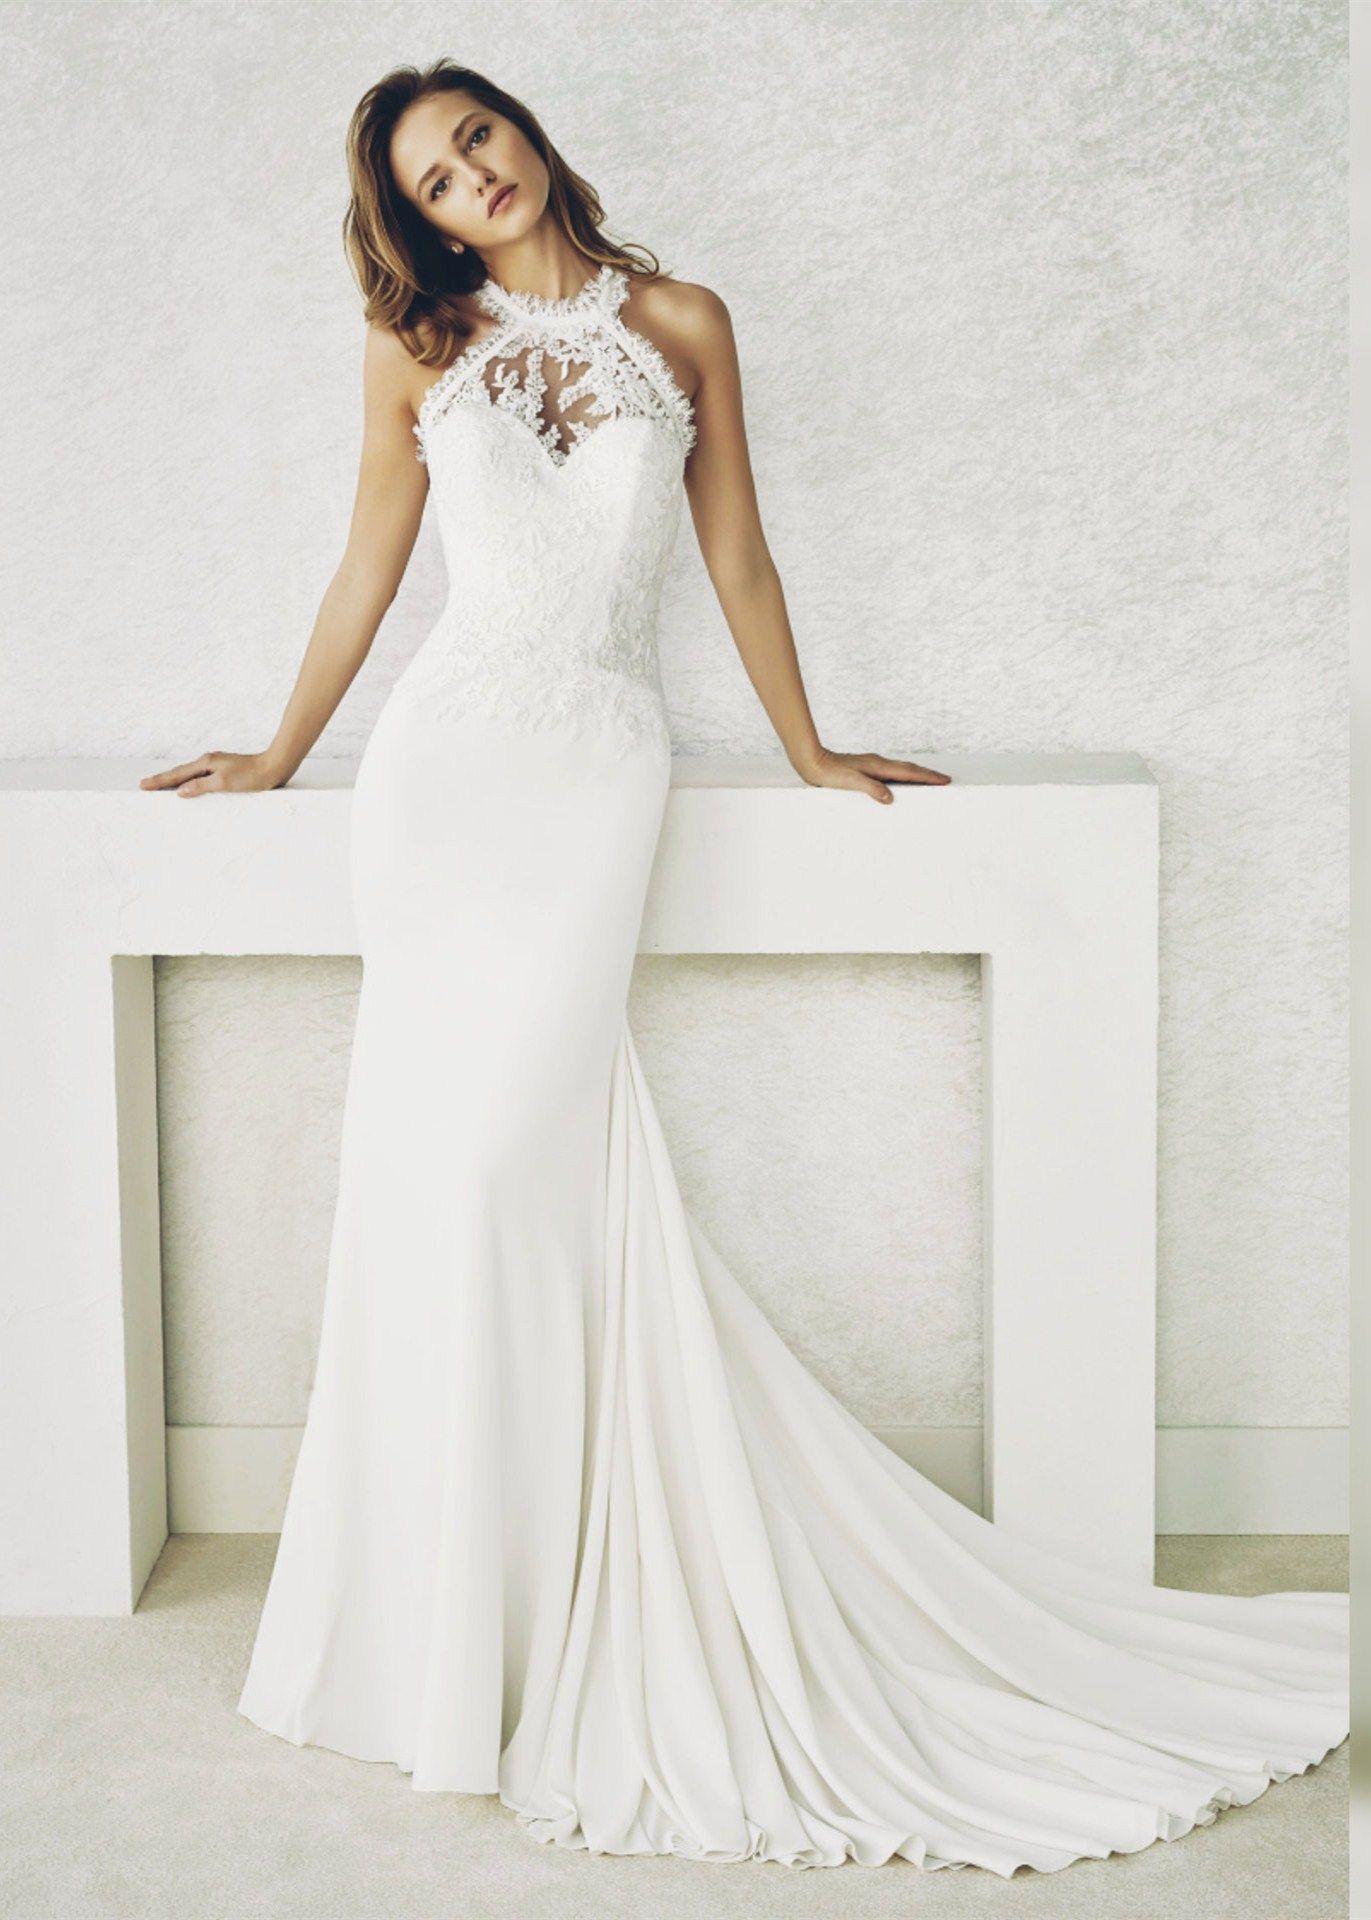 Halter Neck Ivory Lace Chiffon Wedding Dress In 2020 Wedding Dresses White Prom Dress Chiffon Wedding Dress